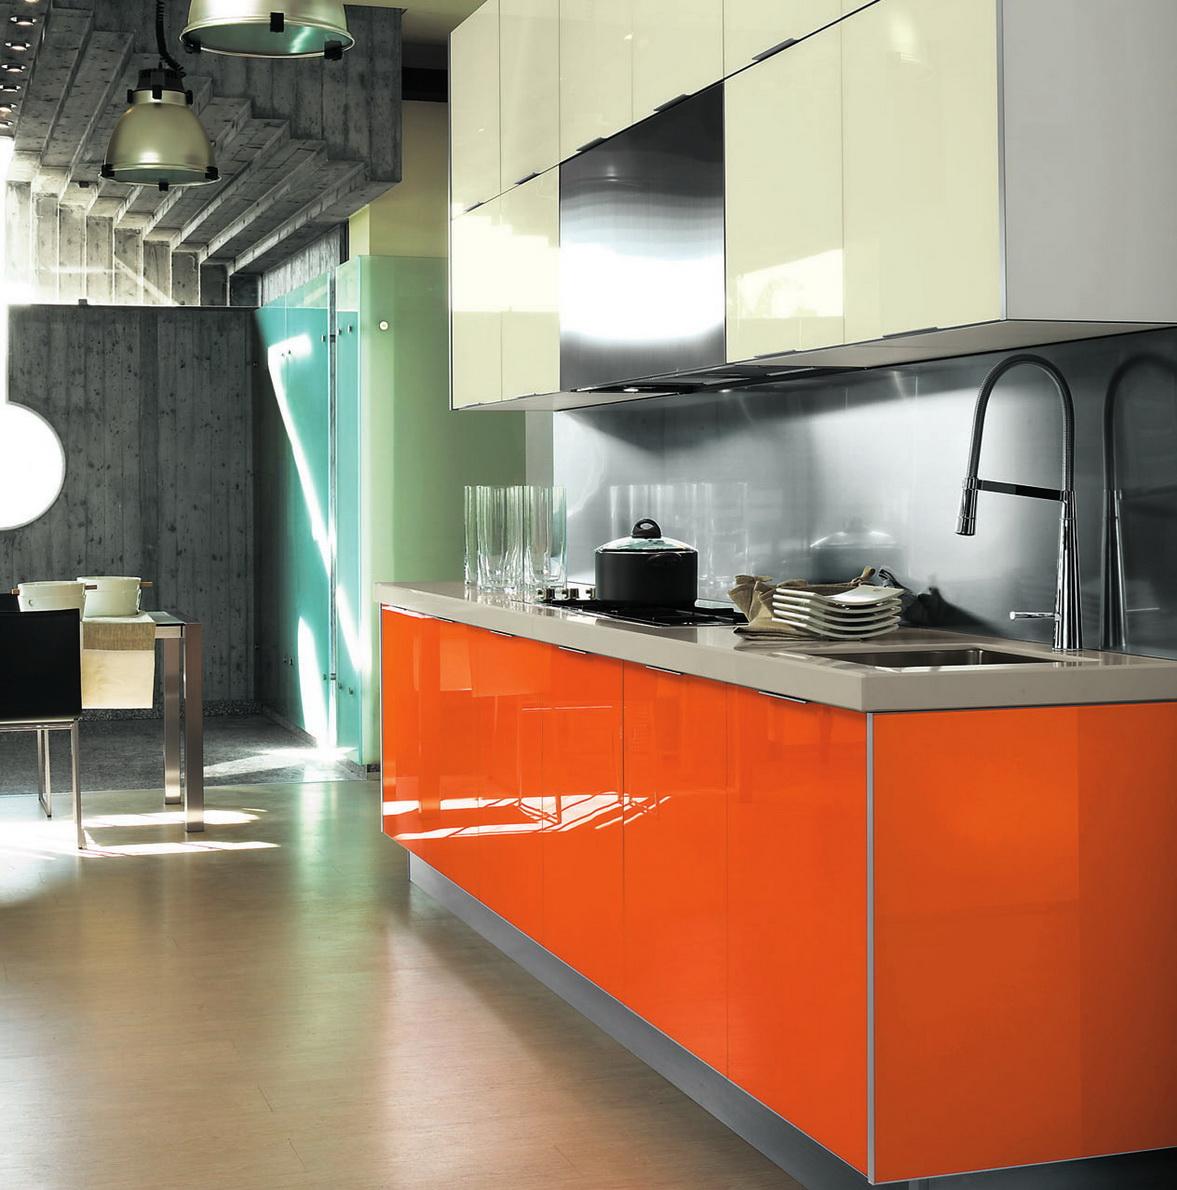 Acrylic Interior Design: Why Choose Acrylic Kitchen Doors?